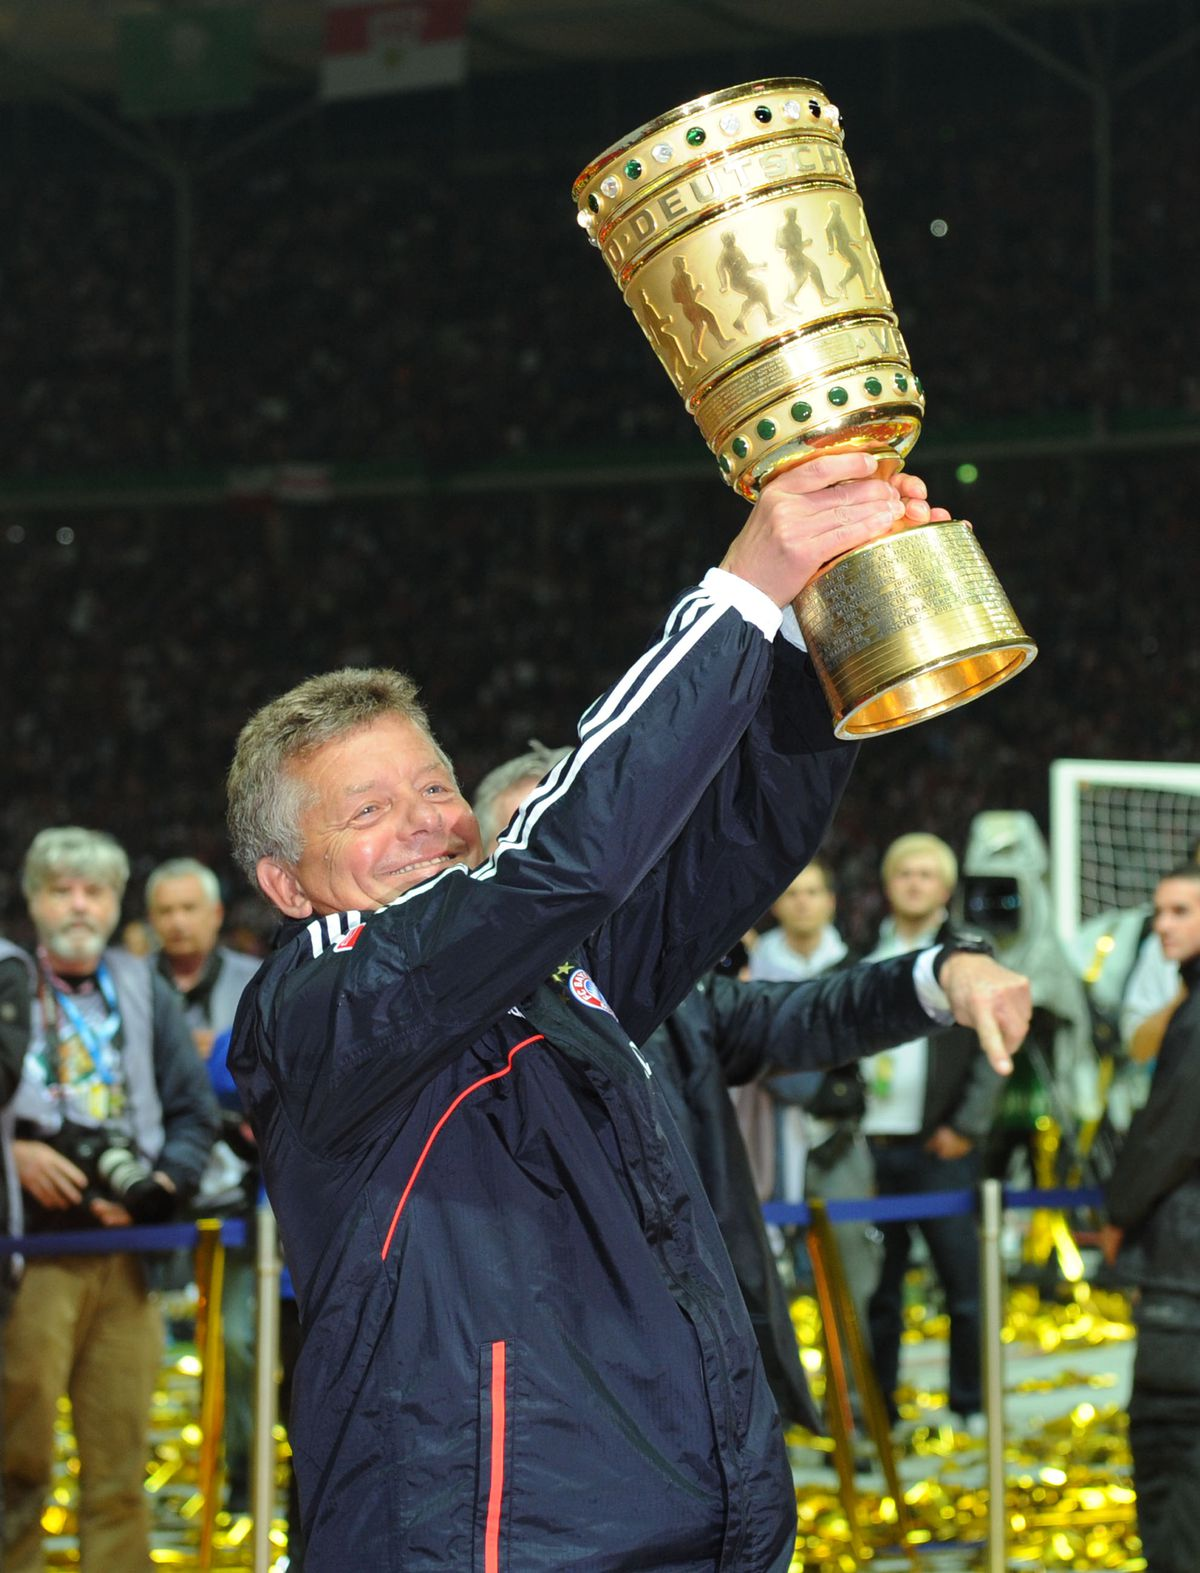 DFB Pokalfinale, FC Bayern München - VfB Stuttgart (GERMANY OUT) Fussball, Saison 2012-2013, DFB-Pokal, Finale in Berlin, FC Bayern München - VfB Stuttgart 3-2, Co-Trainer Peter Hermann (Bayern München) mit dem Pokal.